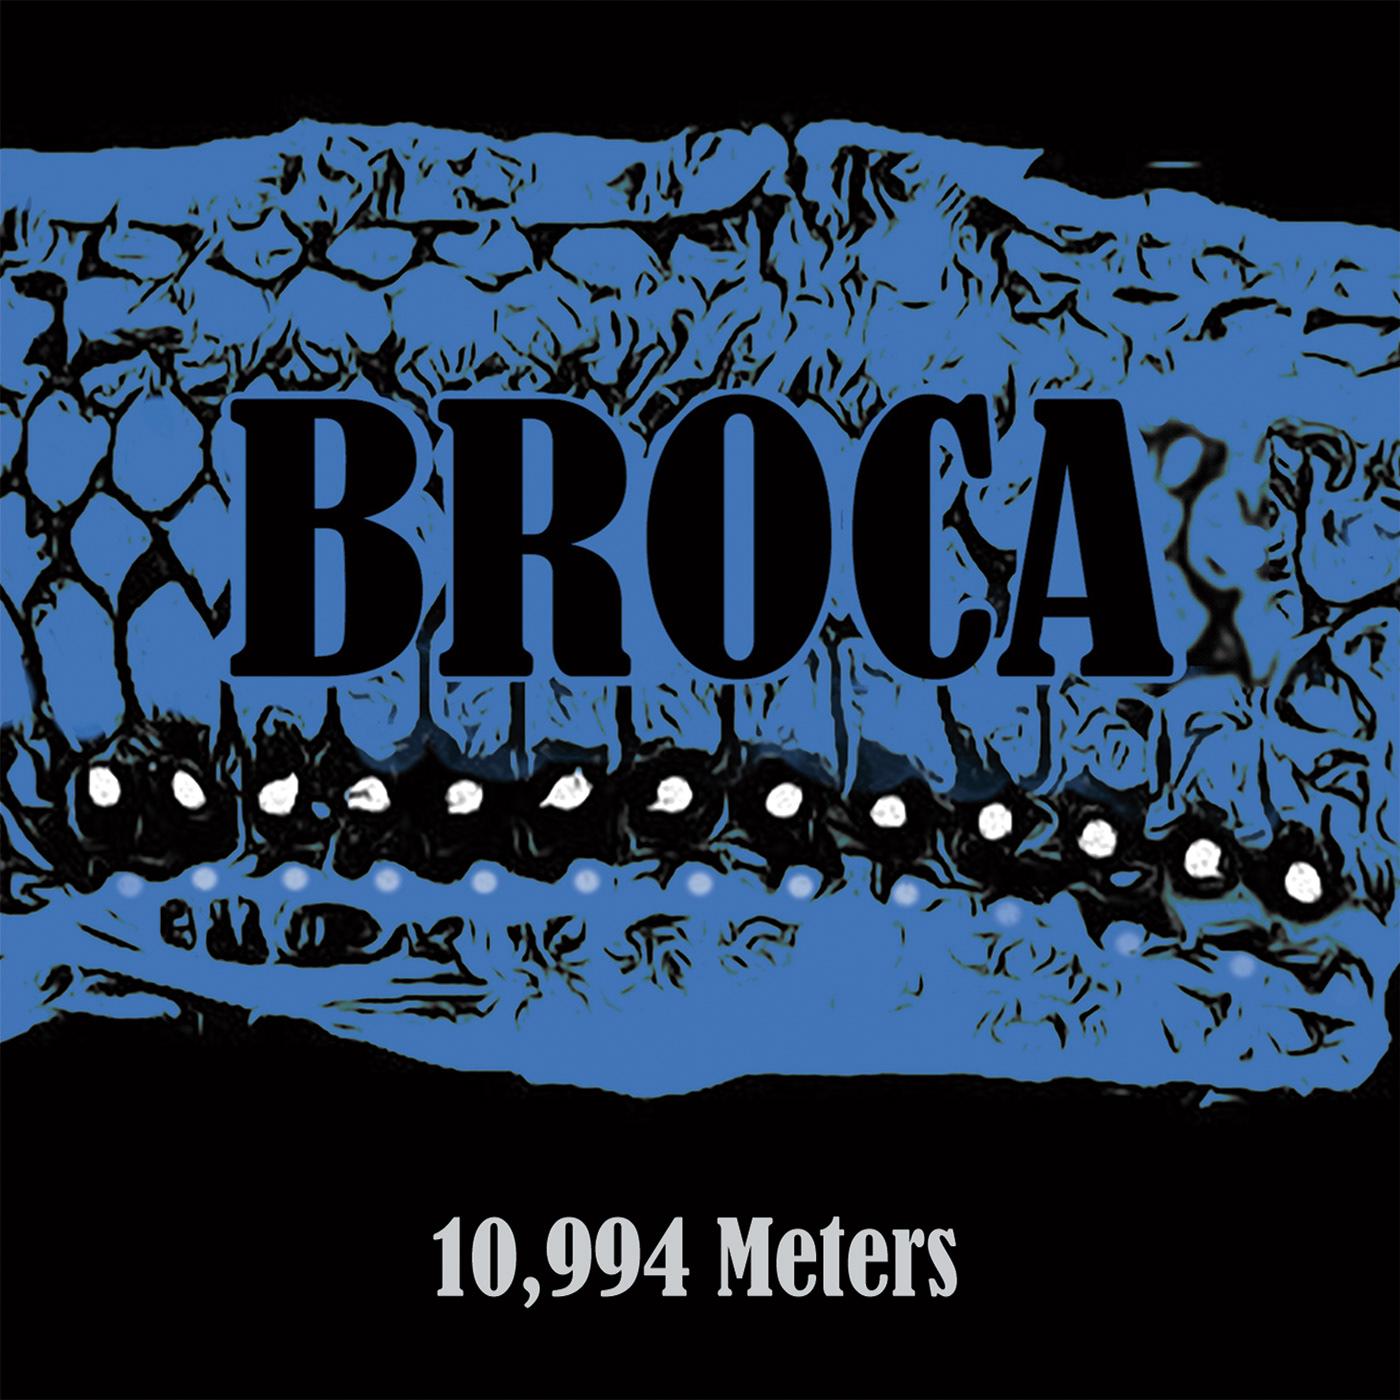 Album artwork by Colin Bragg for Broca